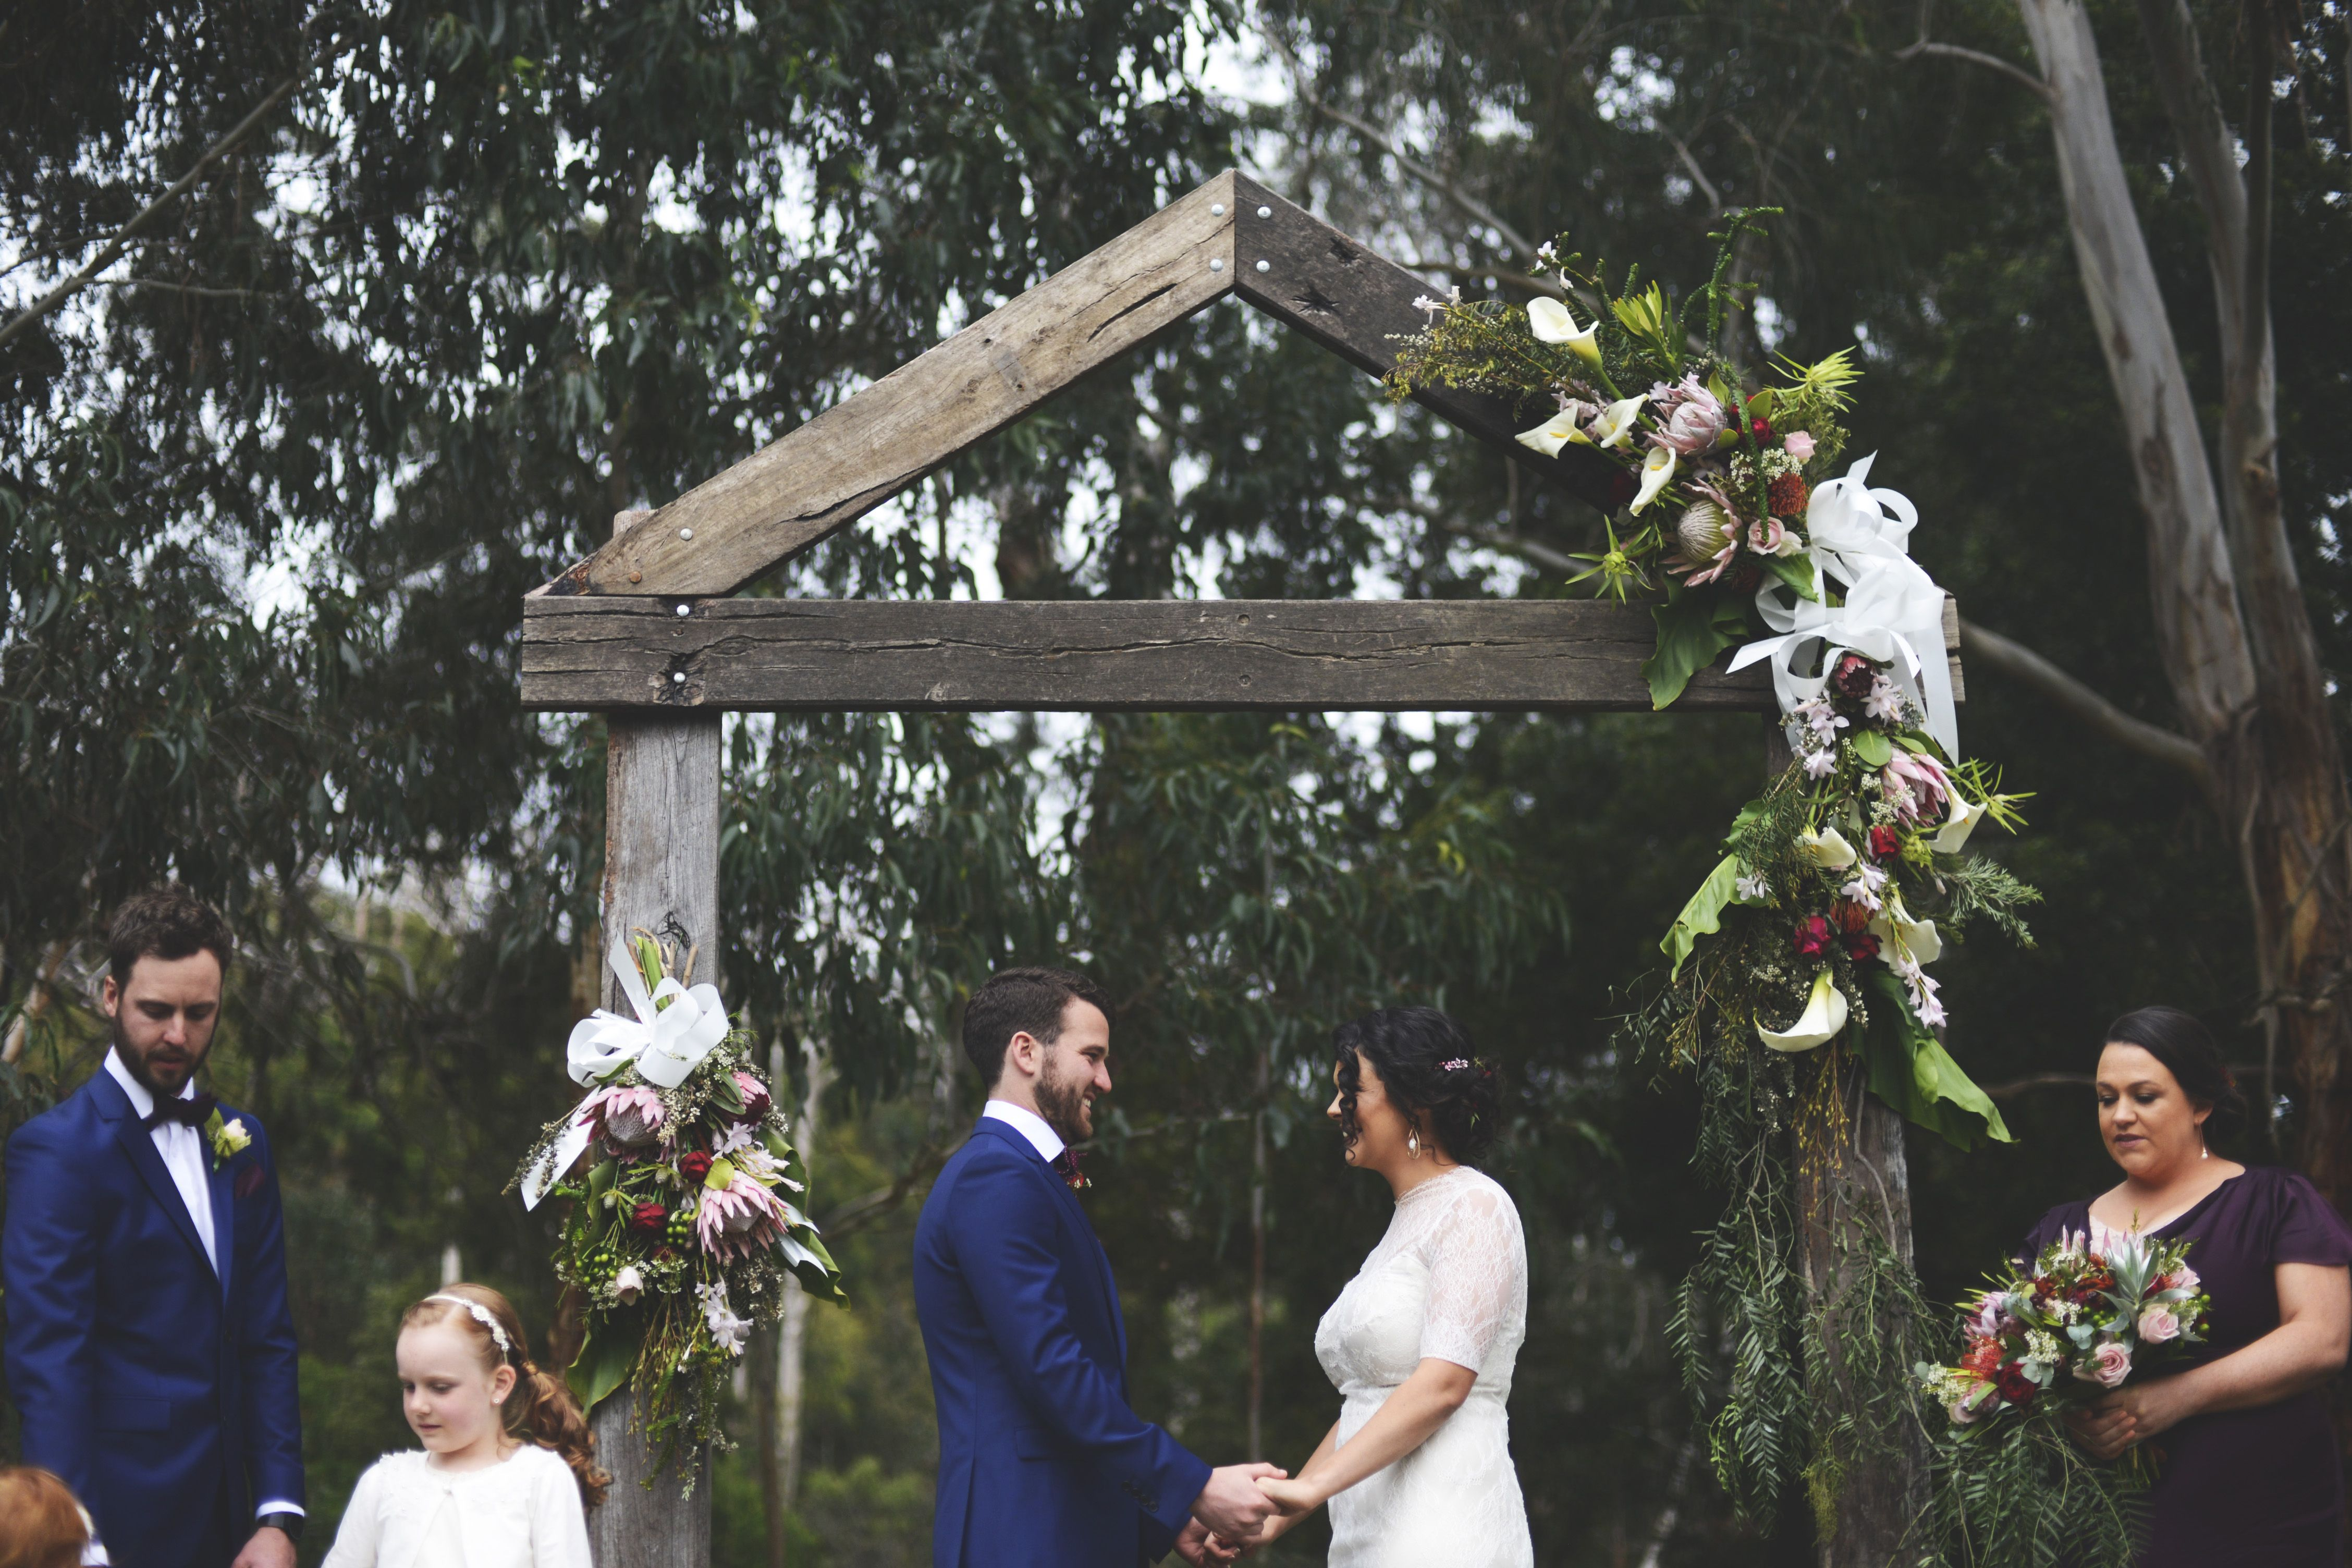 Wedding arbour / arch outdoor wedding